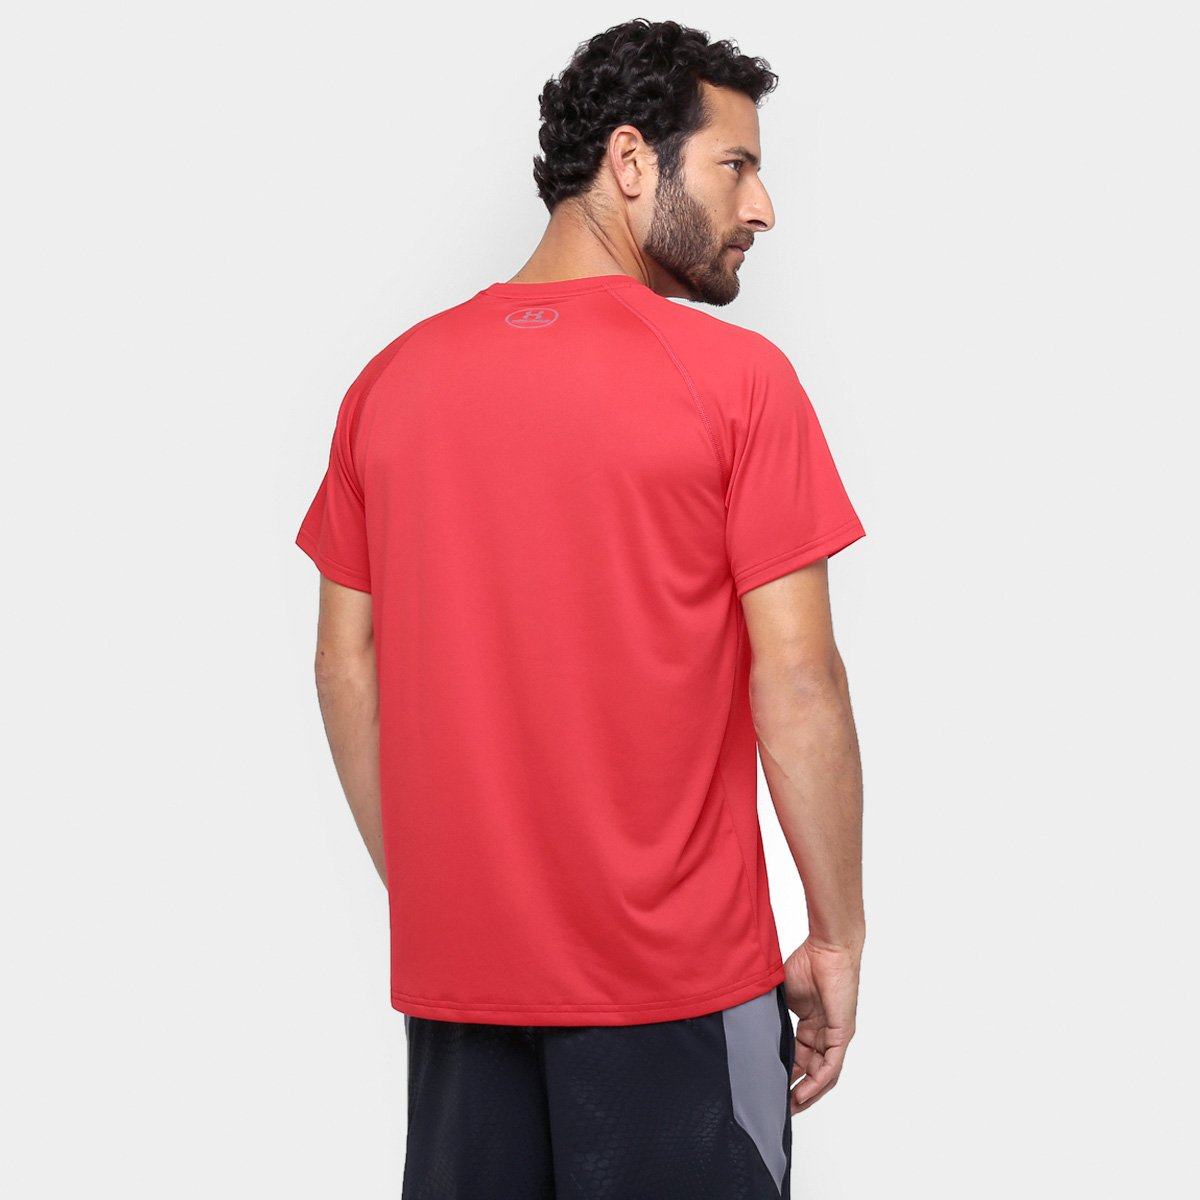 2407fd13f13 Camiseta Under Armour Tech Camo Big Logo Ss T Masculina - Compre ...